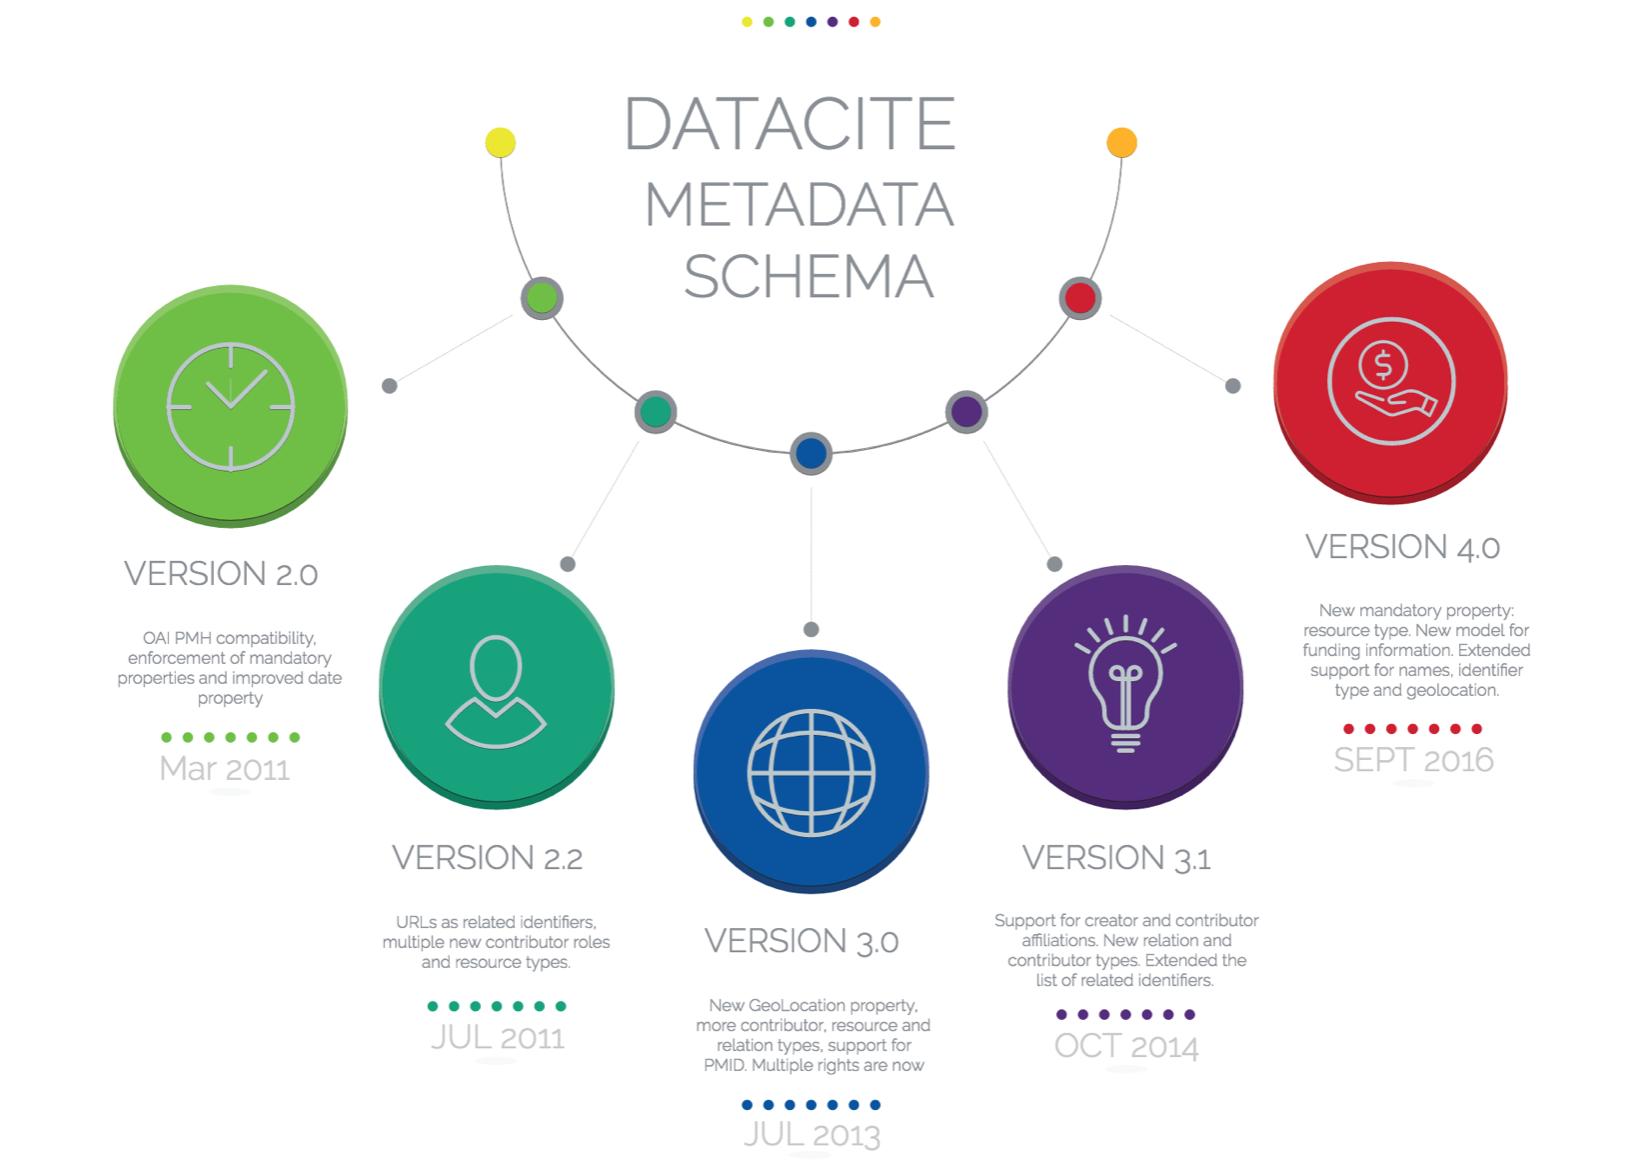 Working with Previous DataCite Metadata Schemas